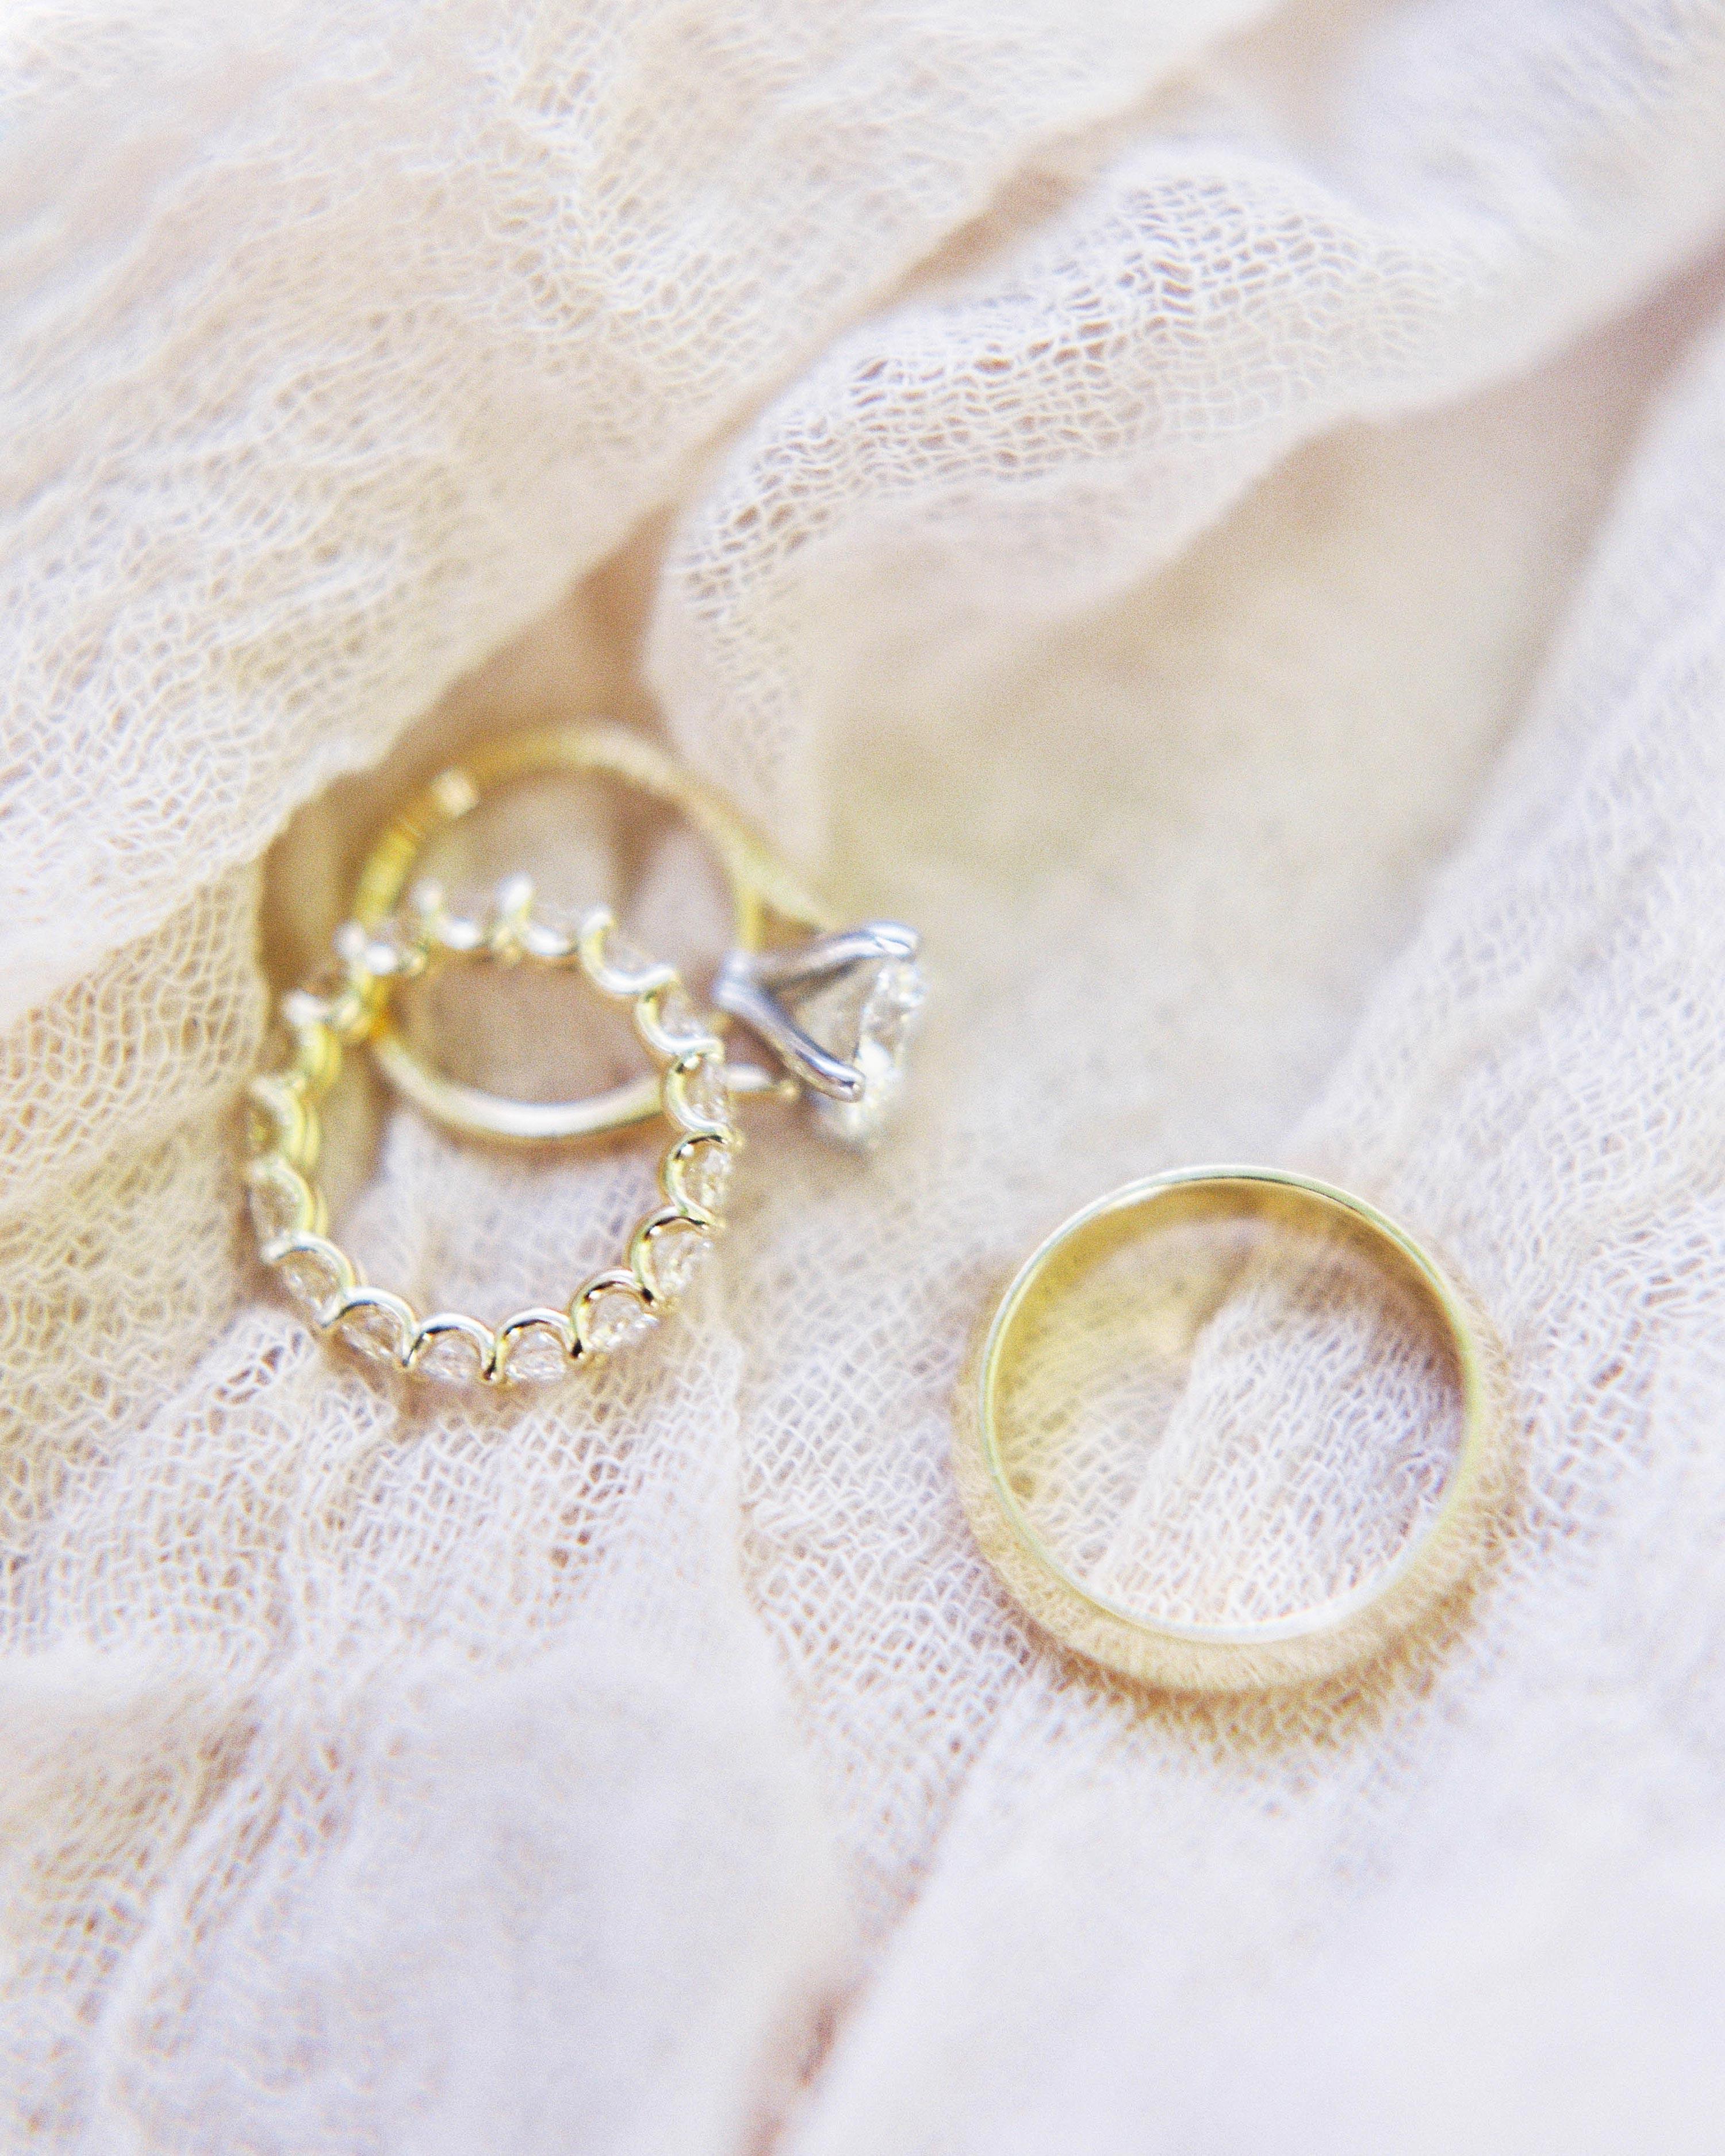 amy-garrison-wedding-rings-00057-6134266-0816.jpg